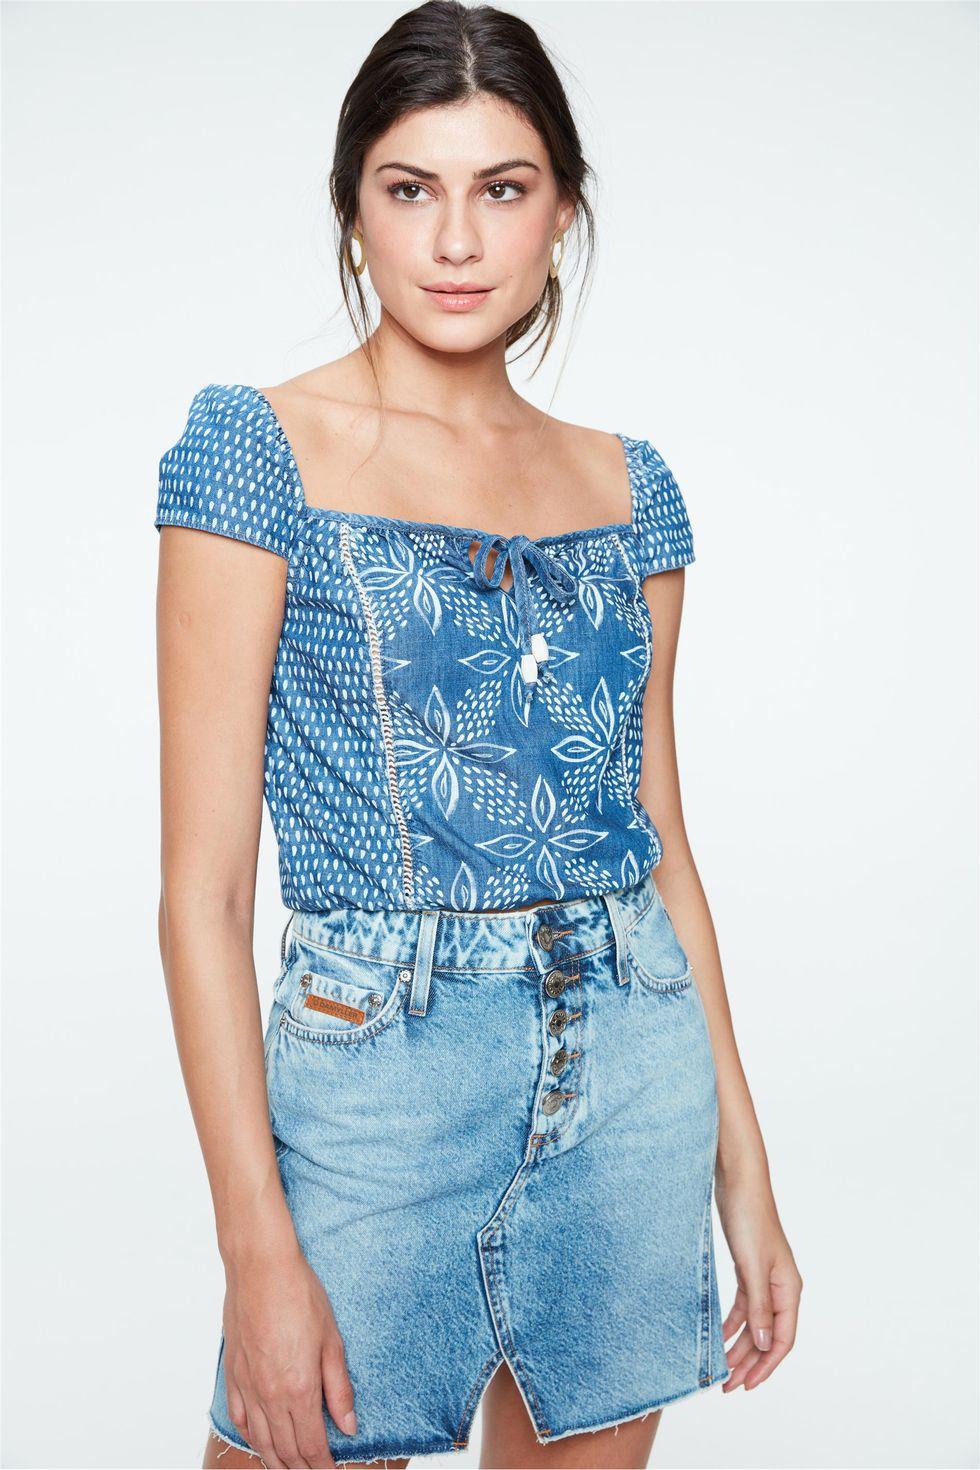 Blusa-Jeans-Cropped-com-Estampa-Floral-Frente--